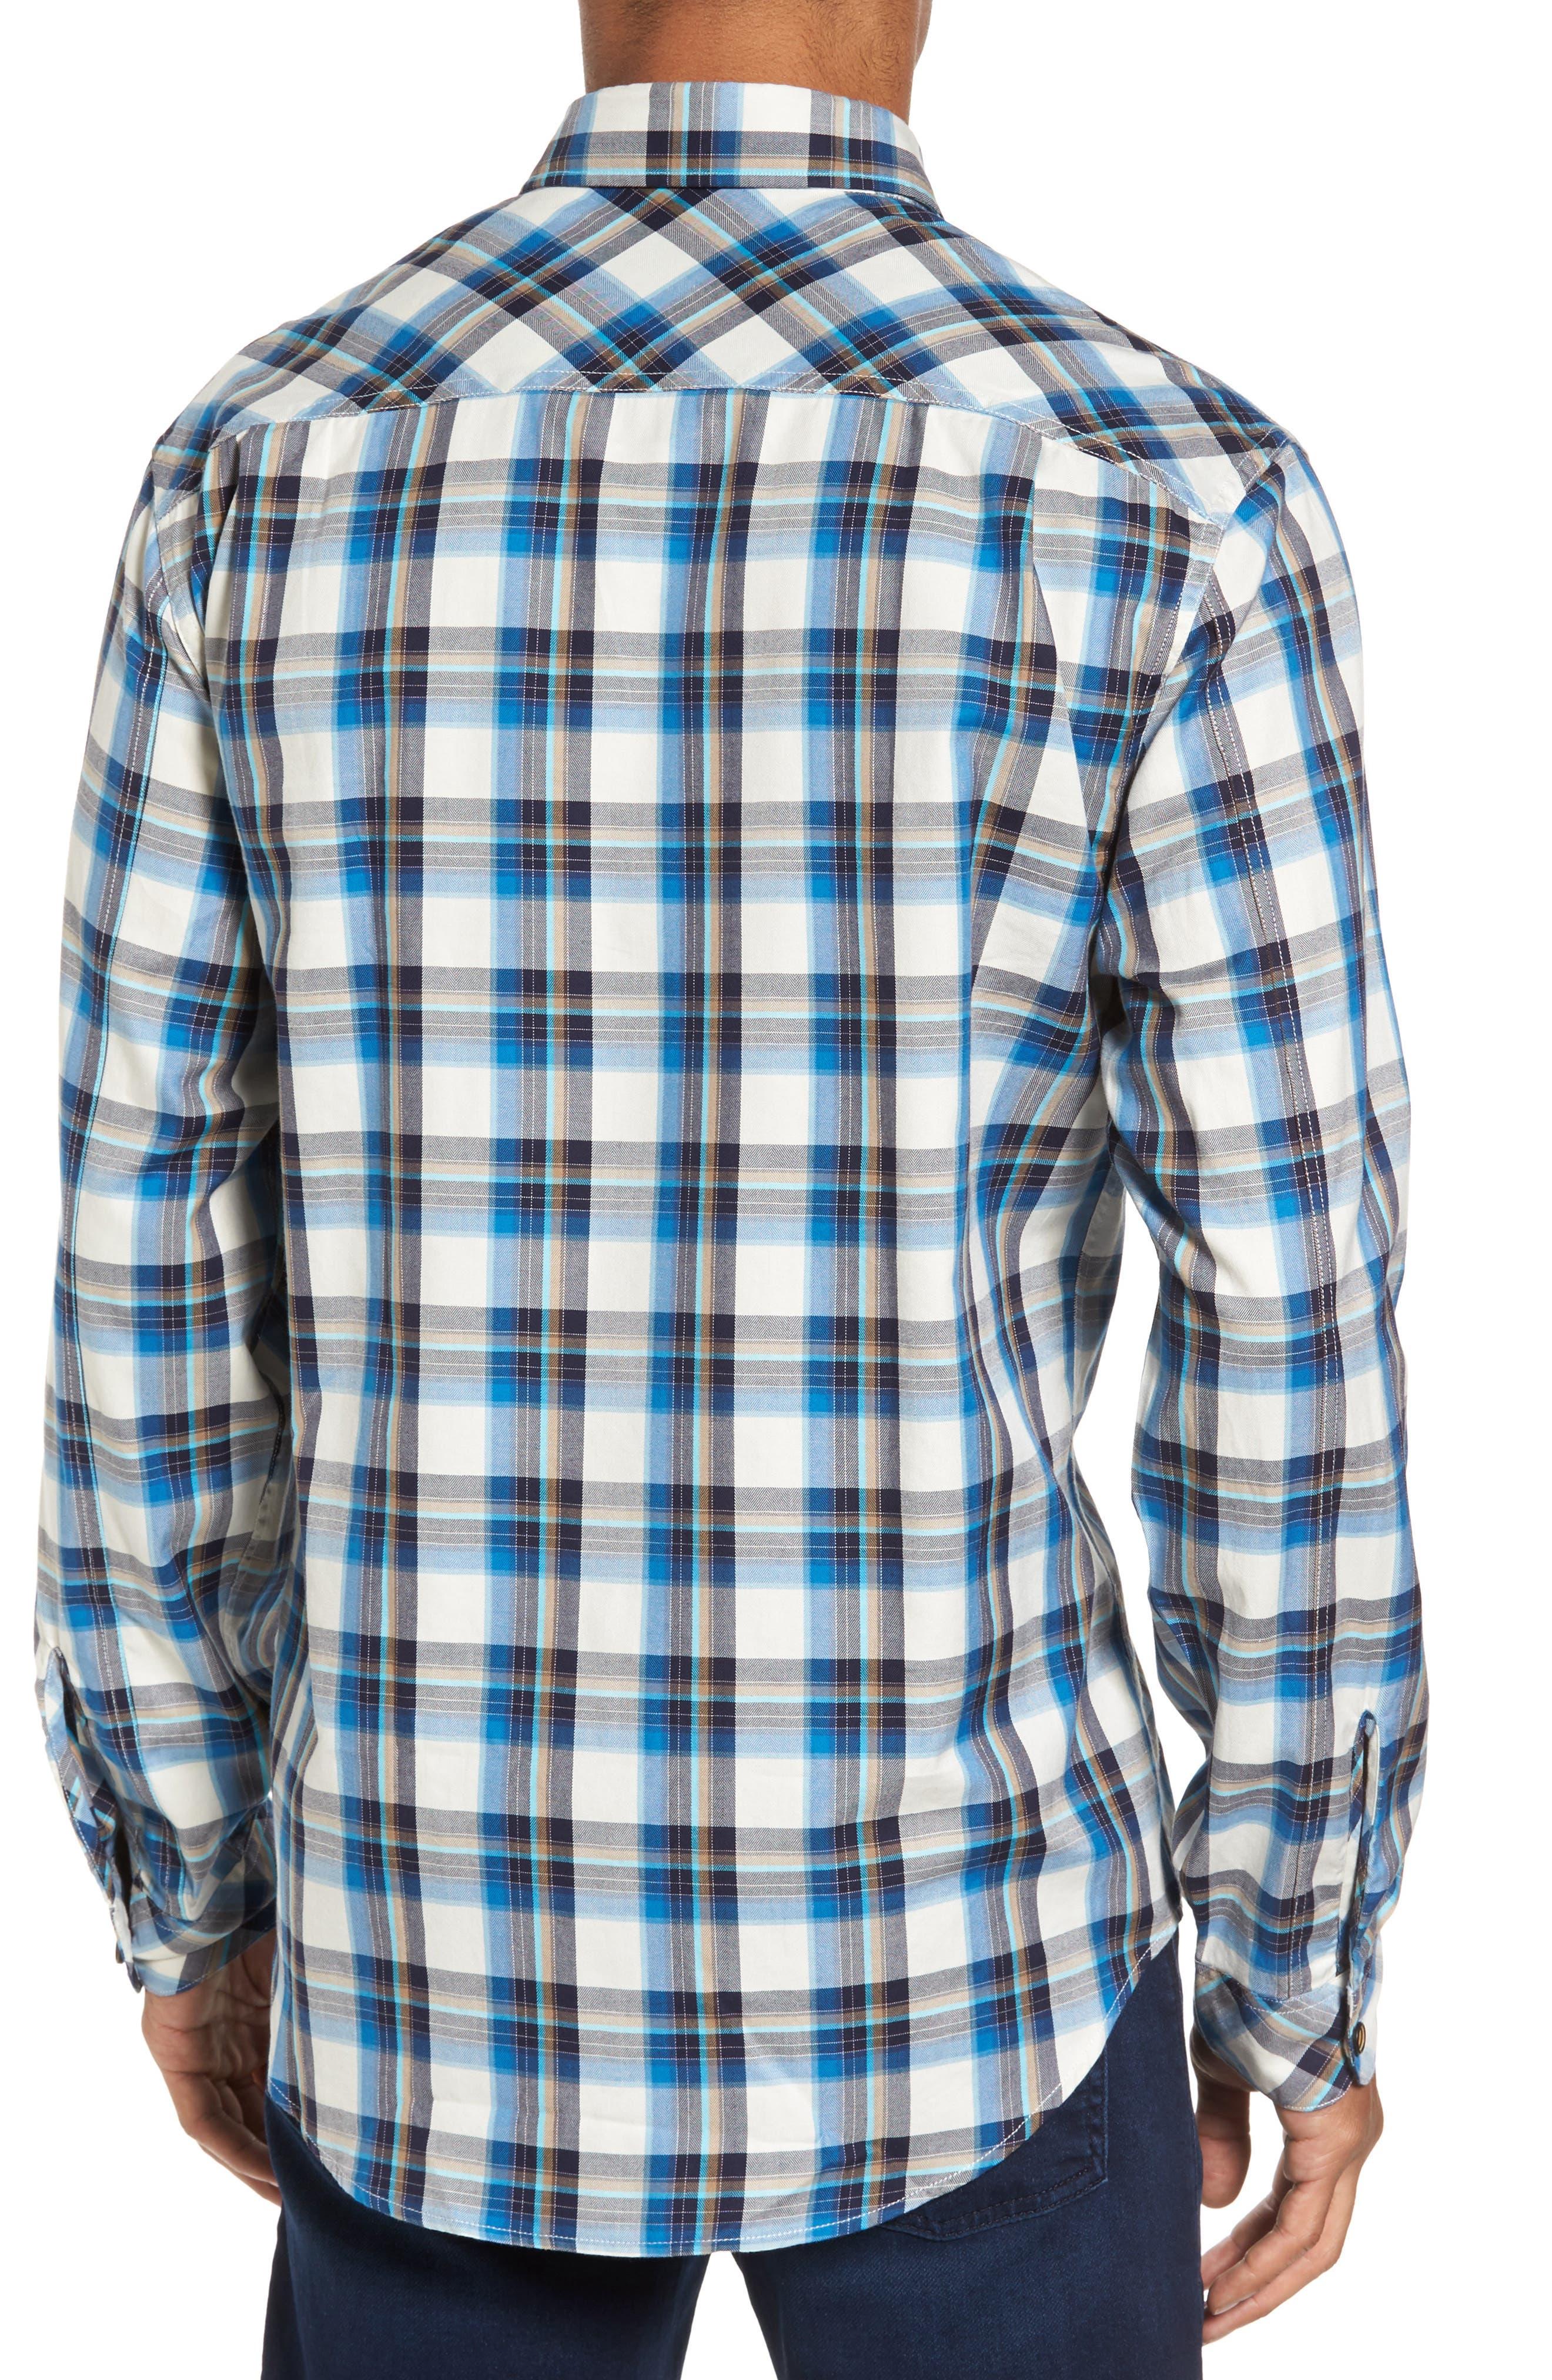 Seacliff Plaid Flannel Shirt,                             Alternate thumbnail 2, color,                             439